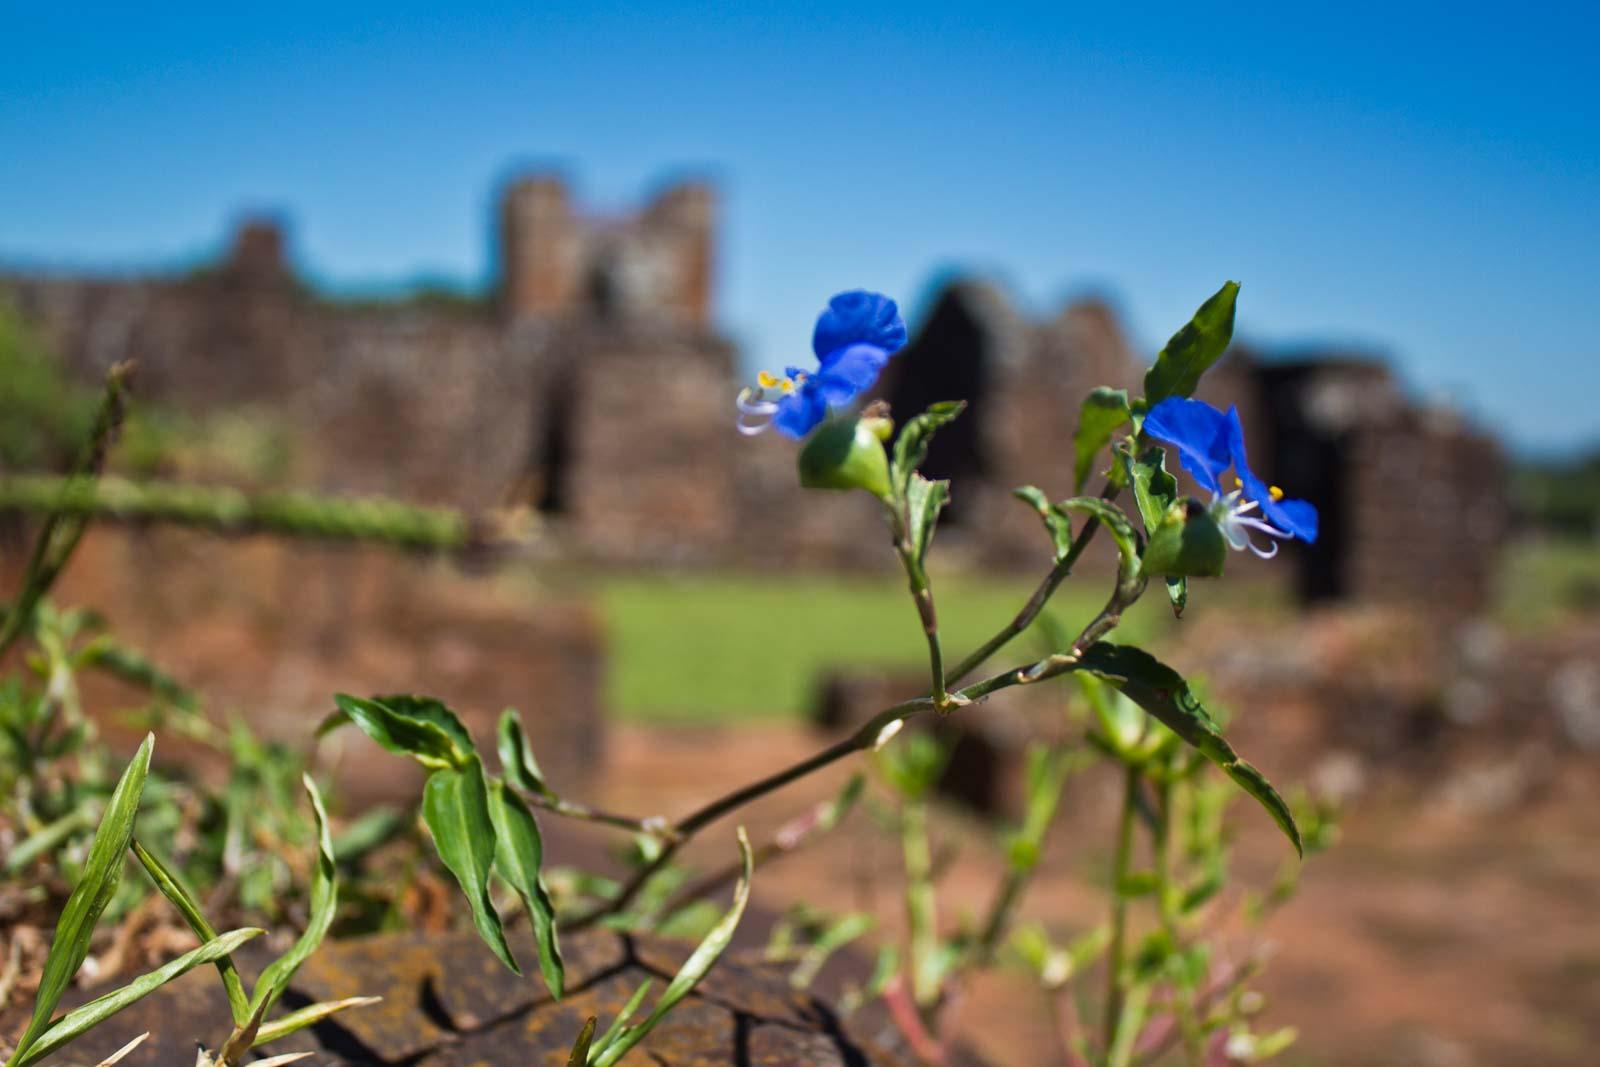 paraguay, jesuit ruins, trinidad, jesus, unesco world heritage site